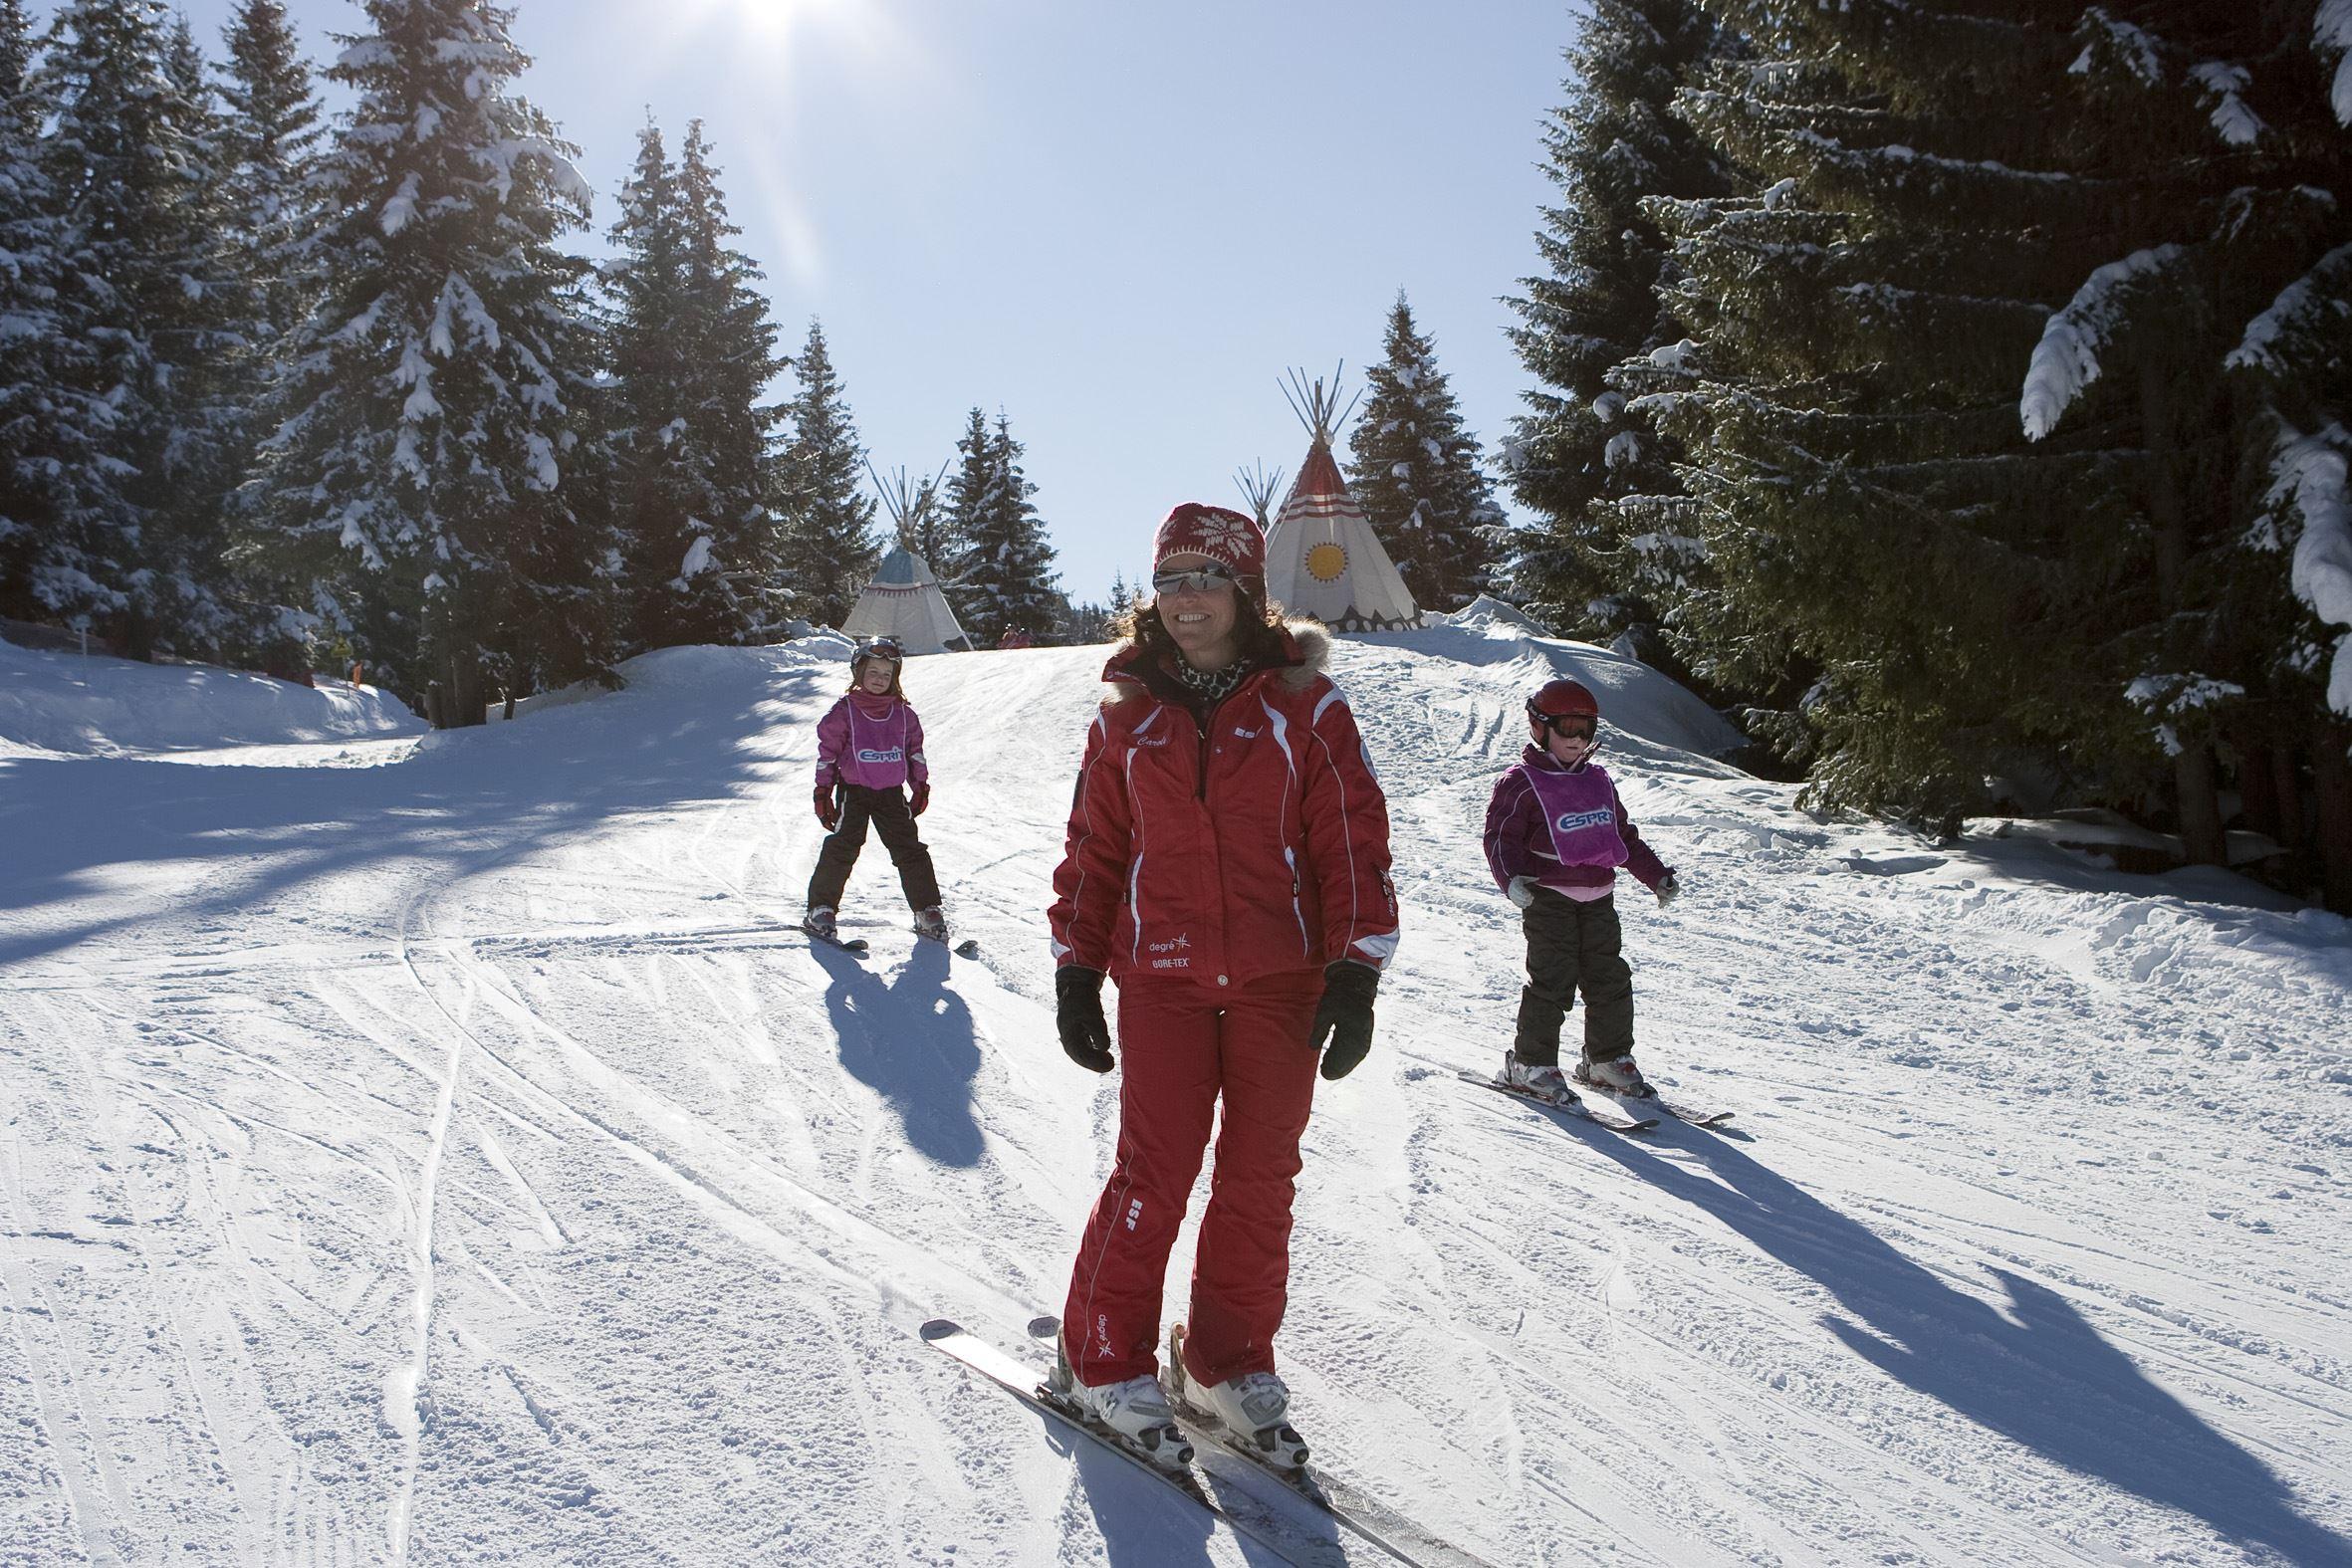 ESF: Ski lessons